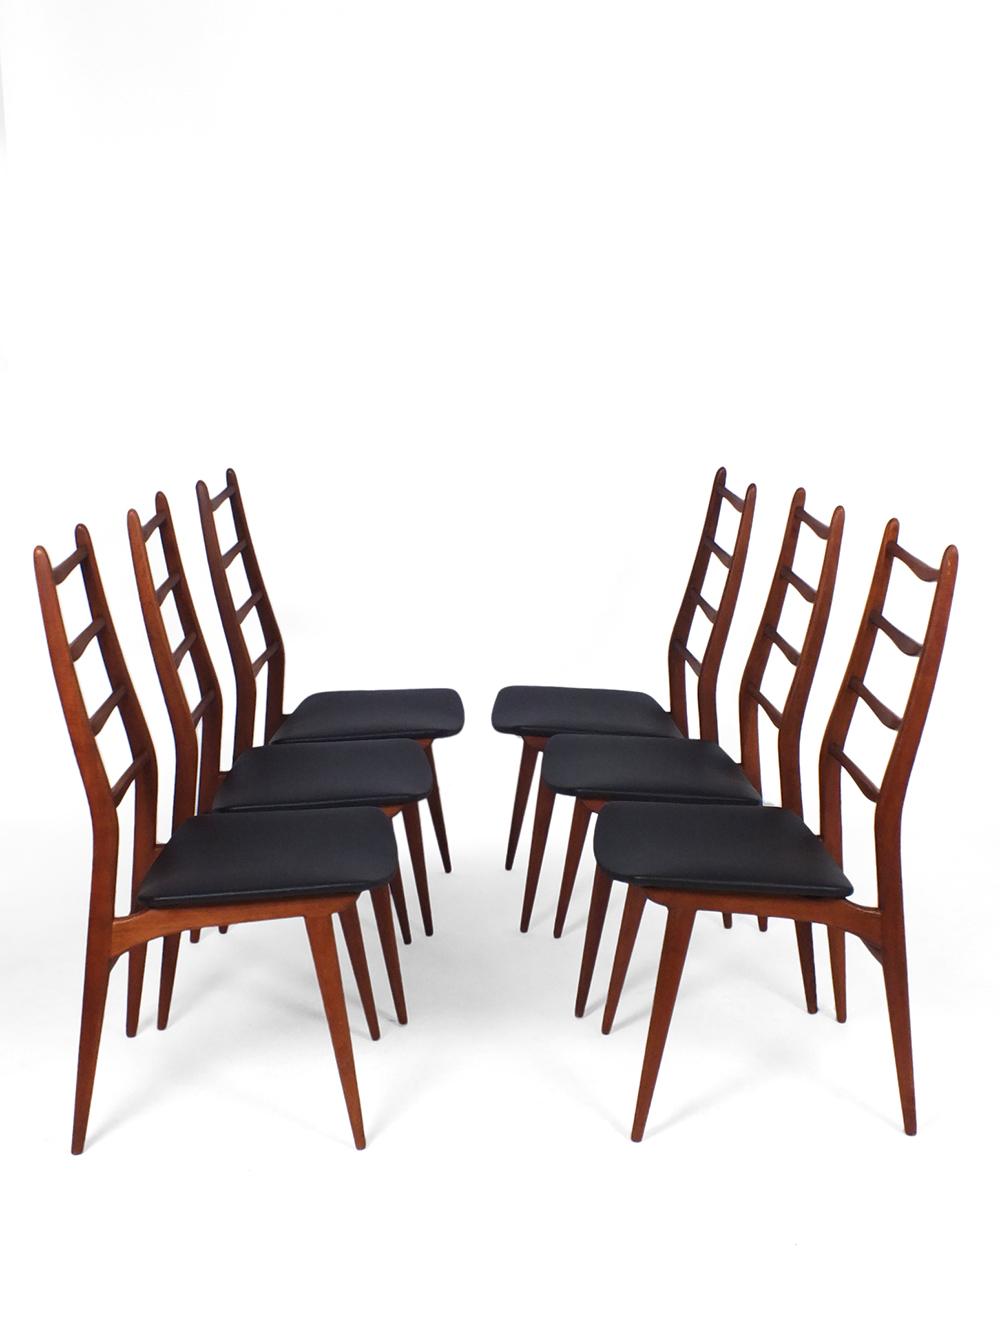 Set 6 Eetkamerstoelen.Set Of 6 Teak Dining Chairs Vaen